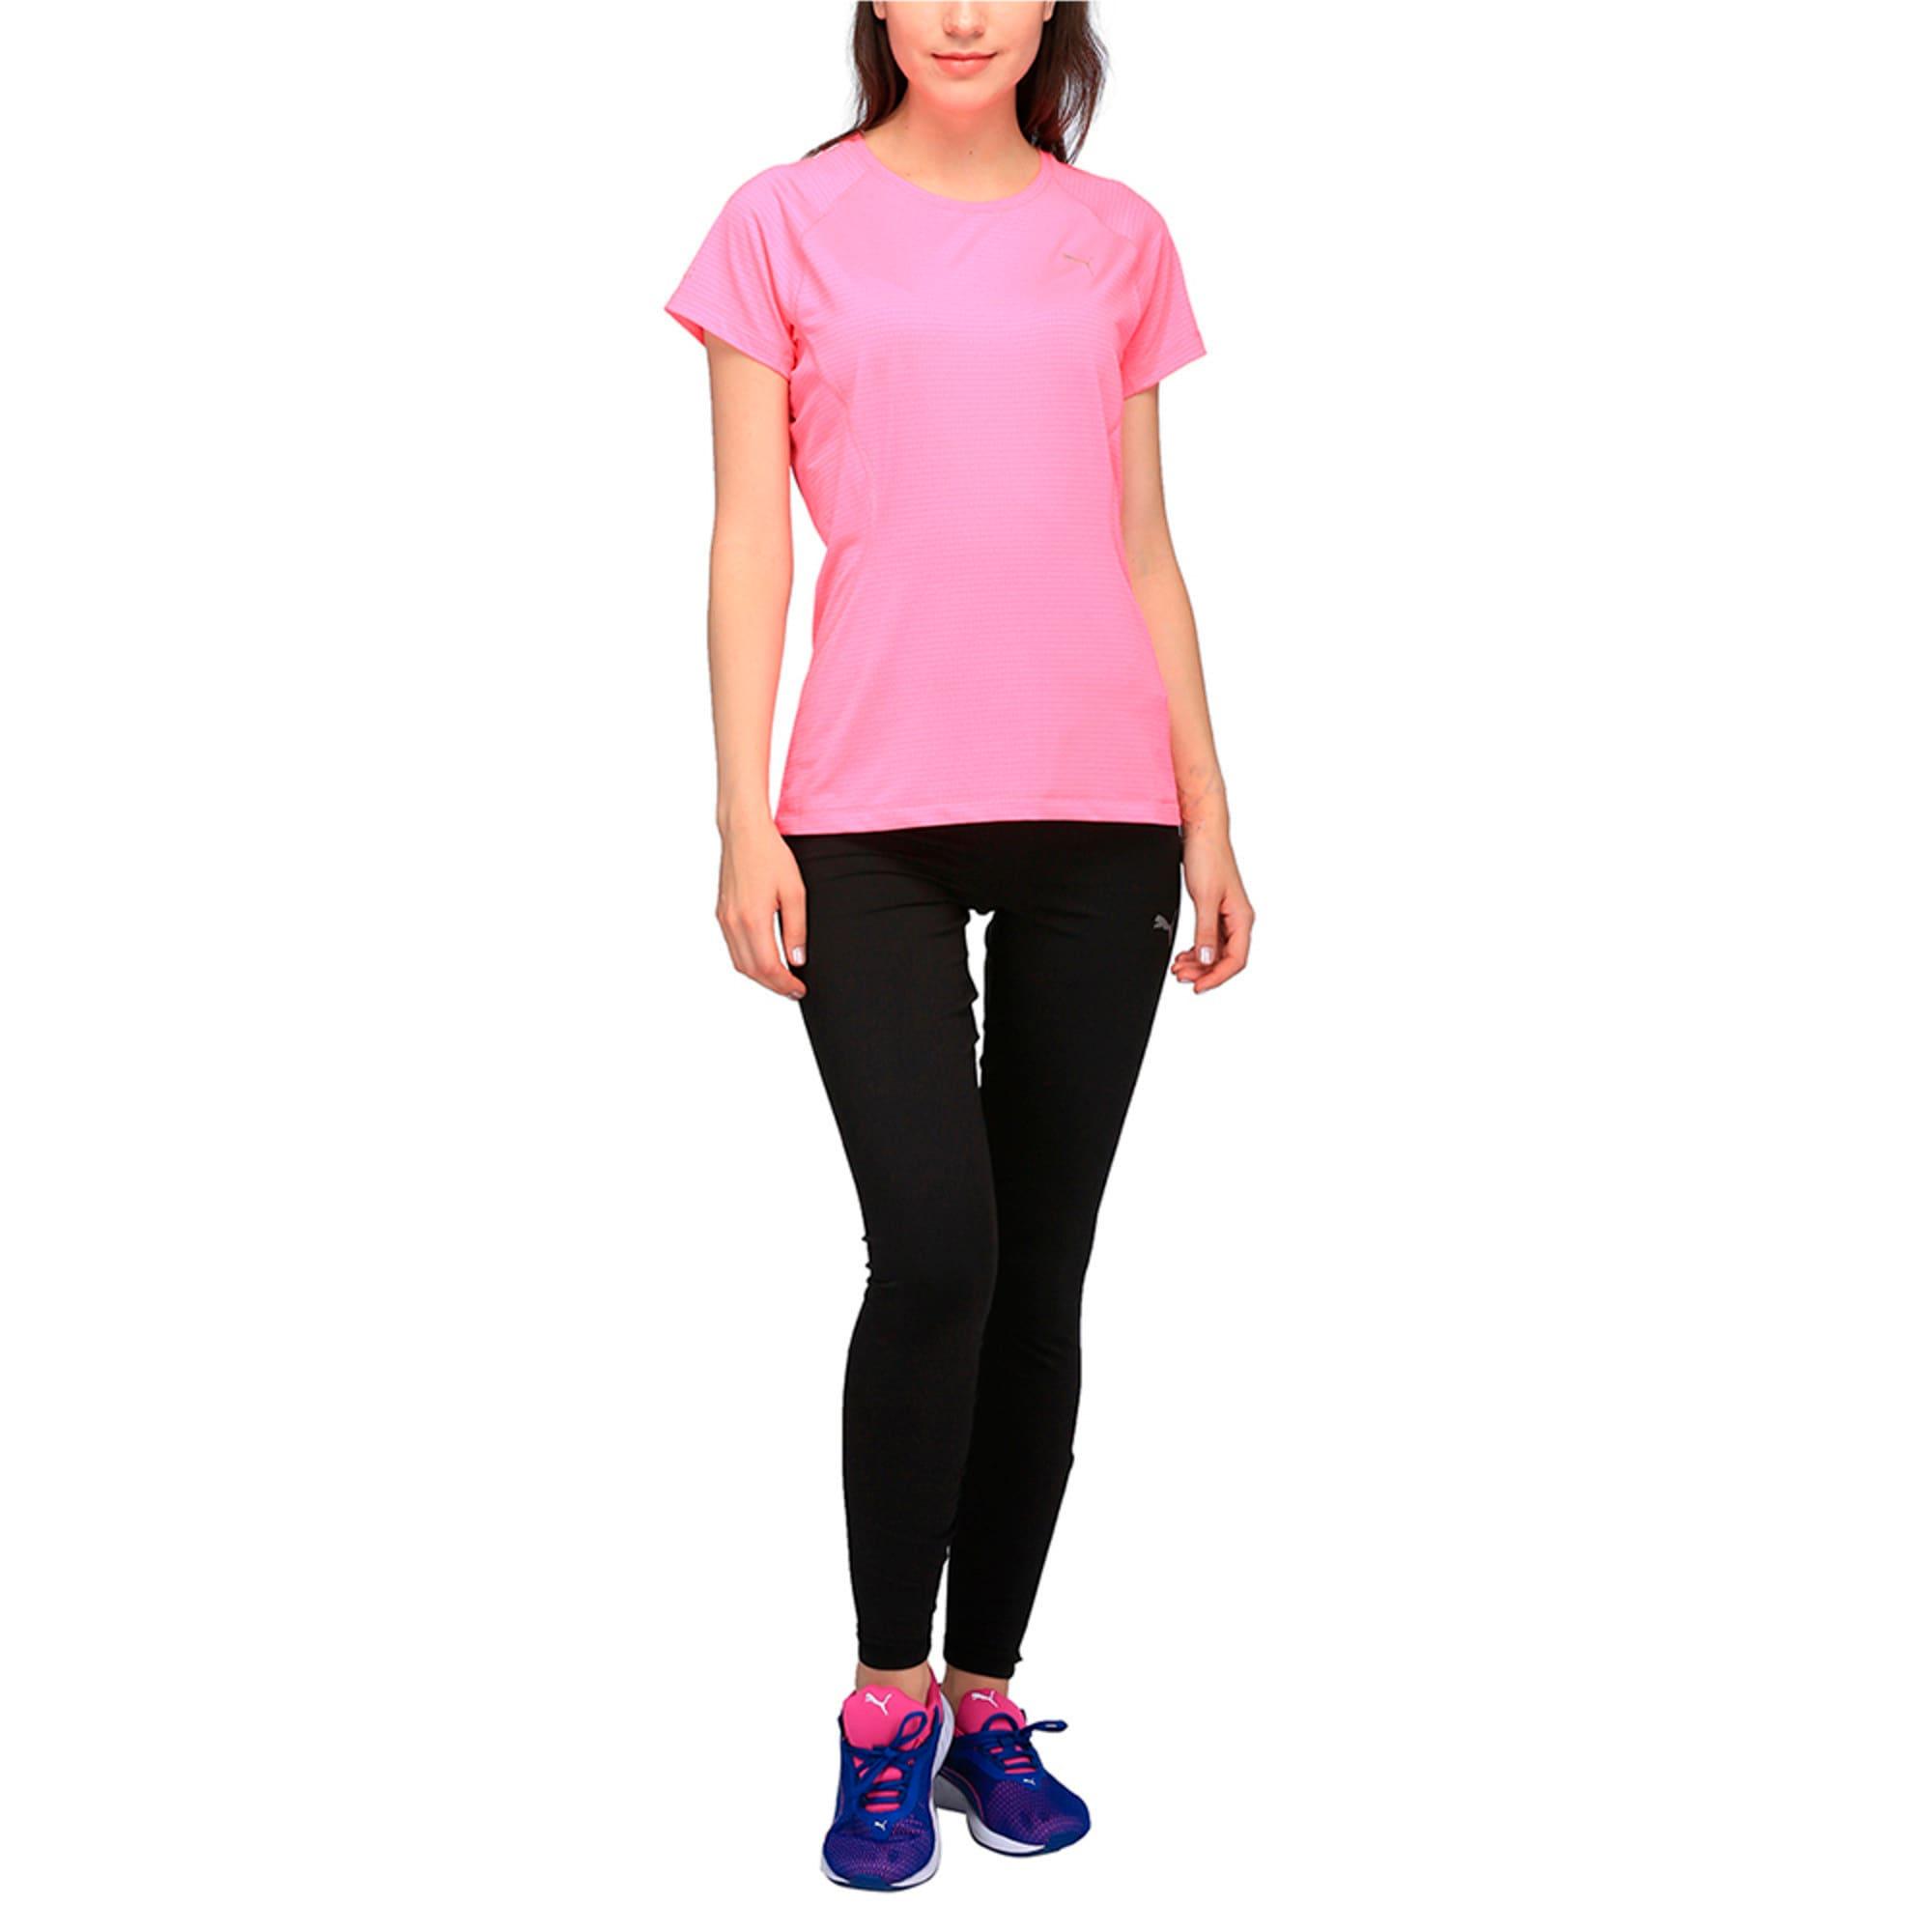 Thumbnail 2 of Women's Running Speed Short Sleeves Tee, KNOCKOUT PINK Heather, medium-IND